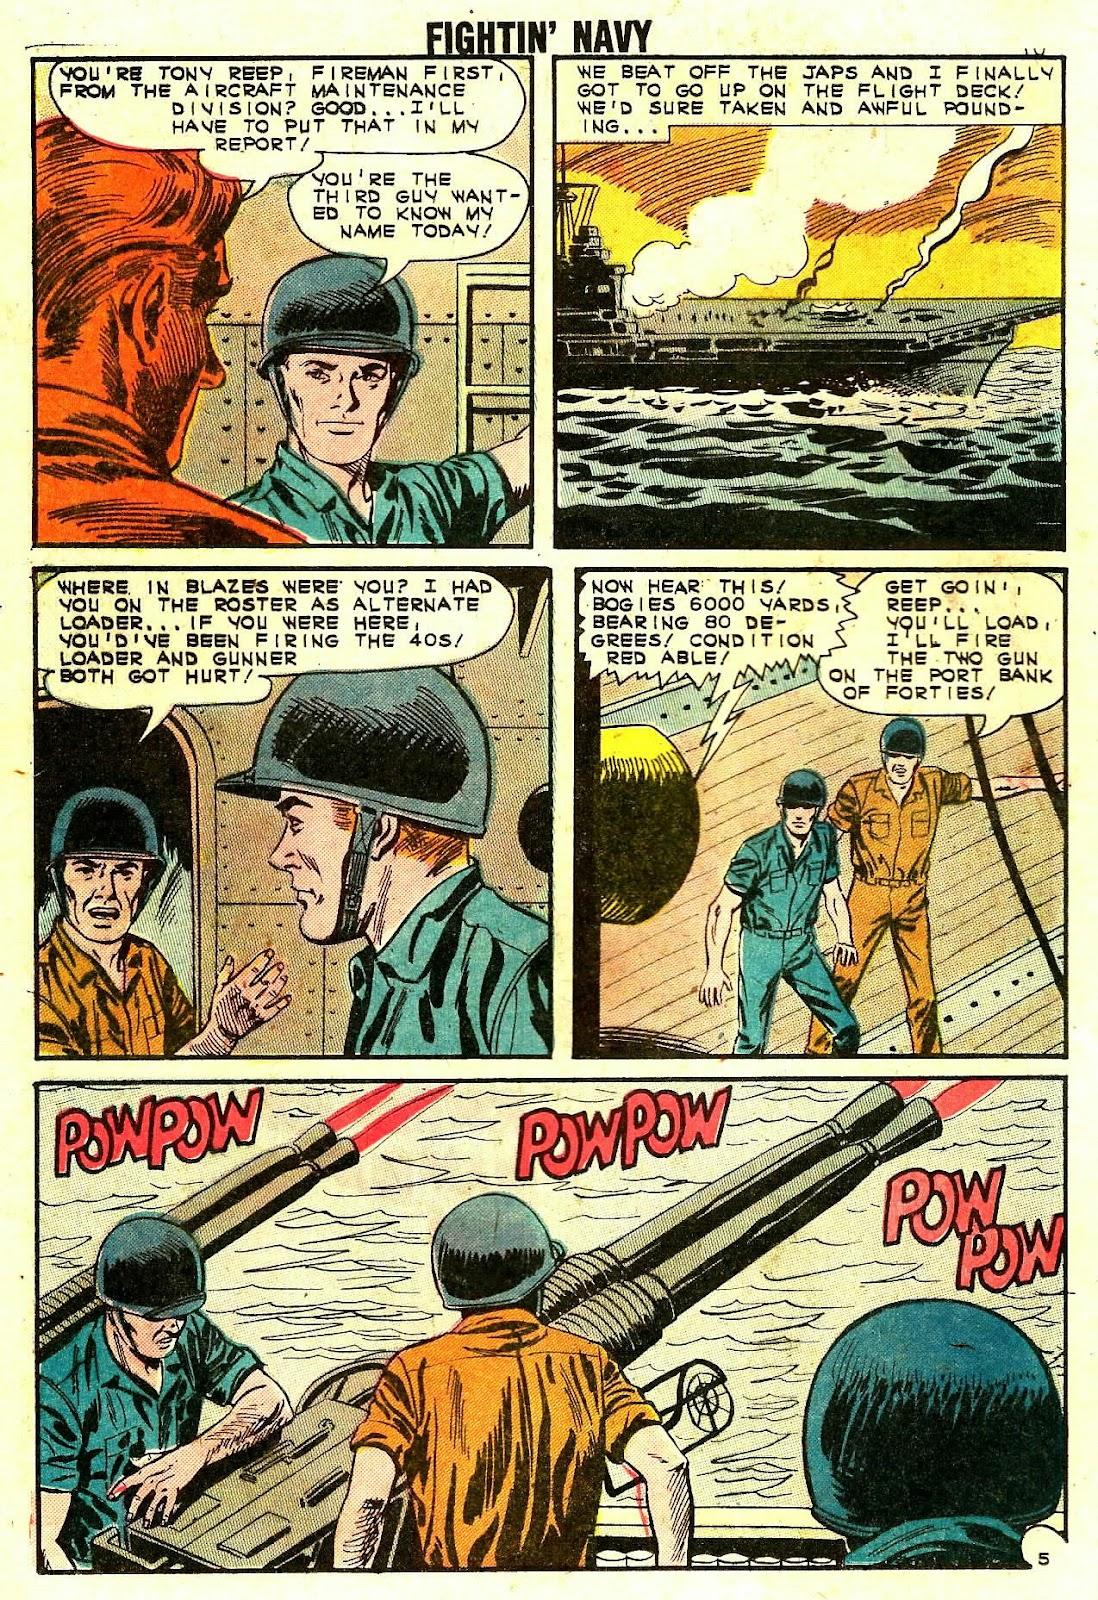 Read online Fightin' Navy comic -  Issue #109 - 12